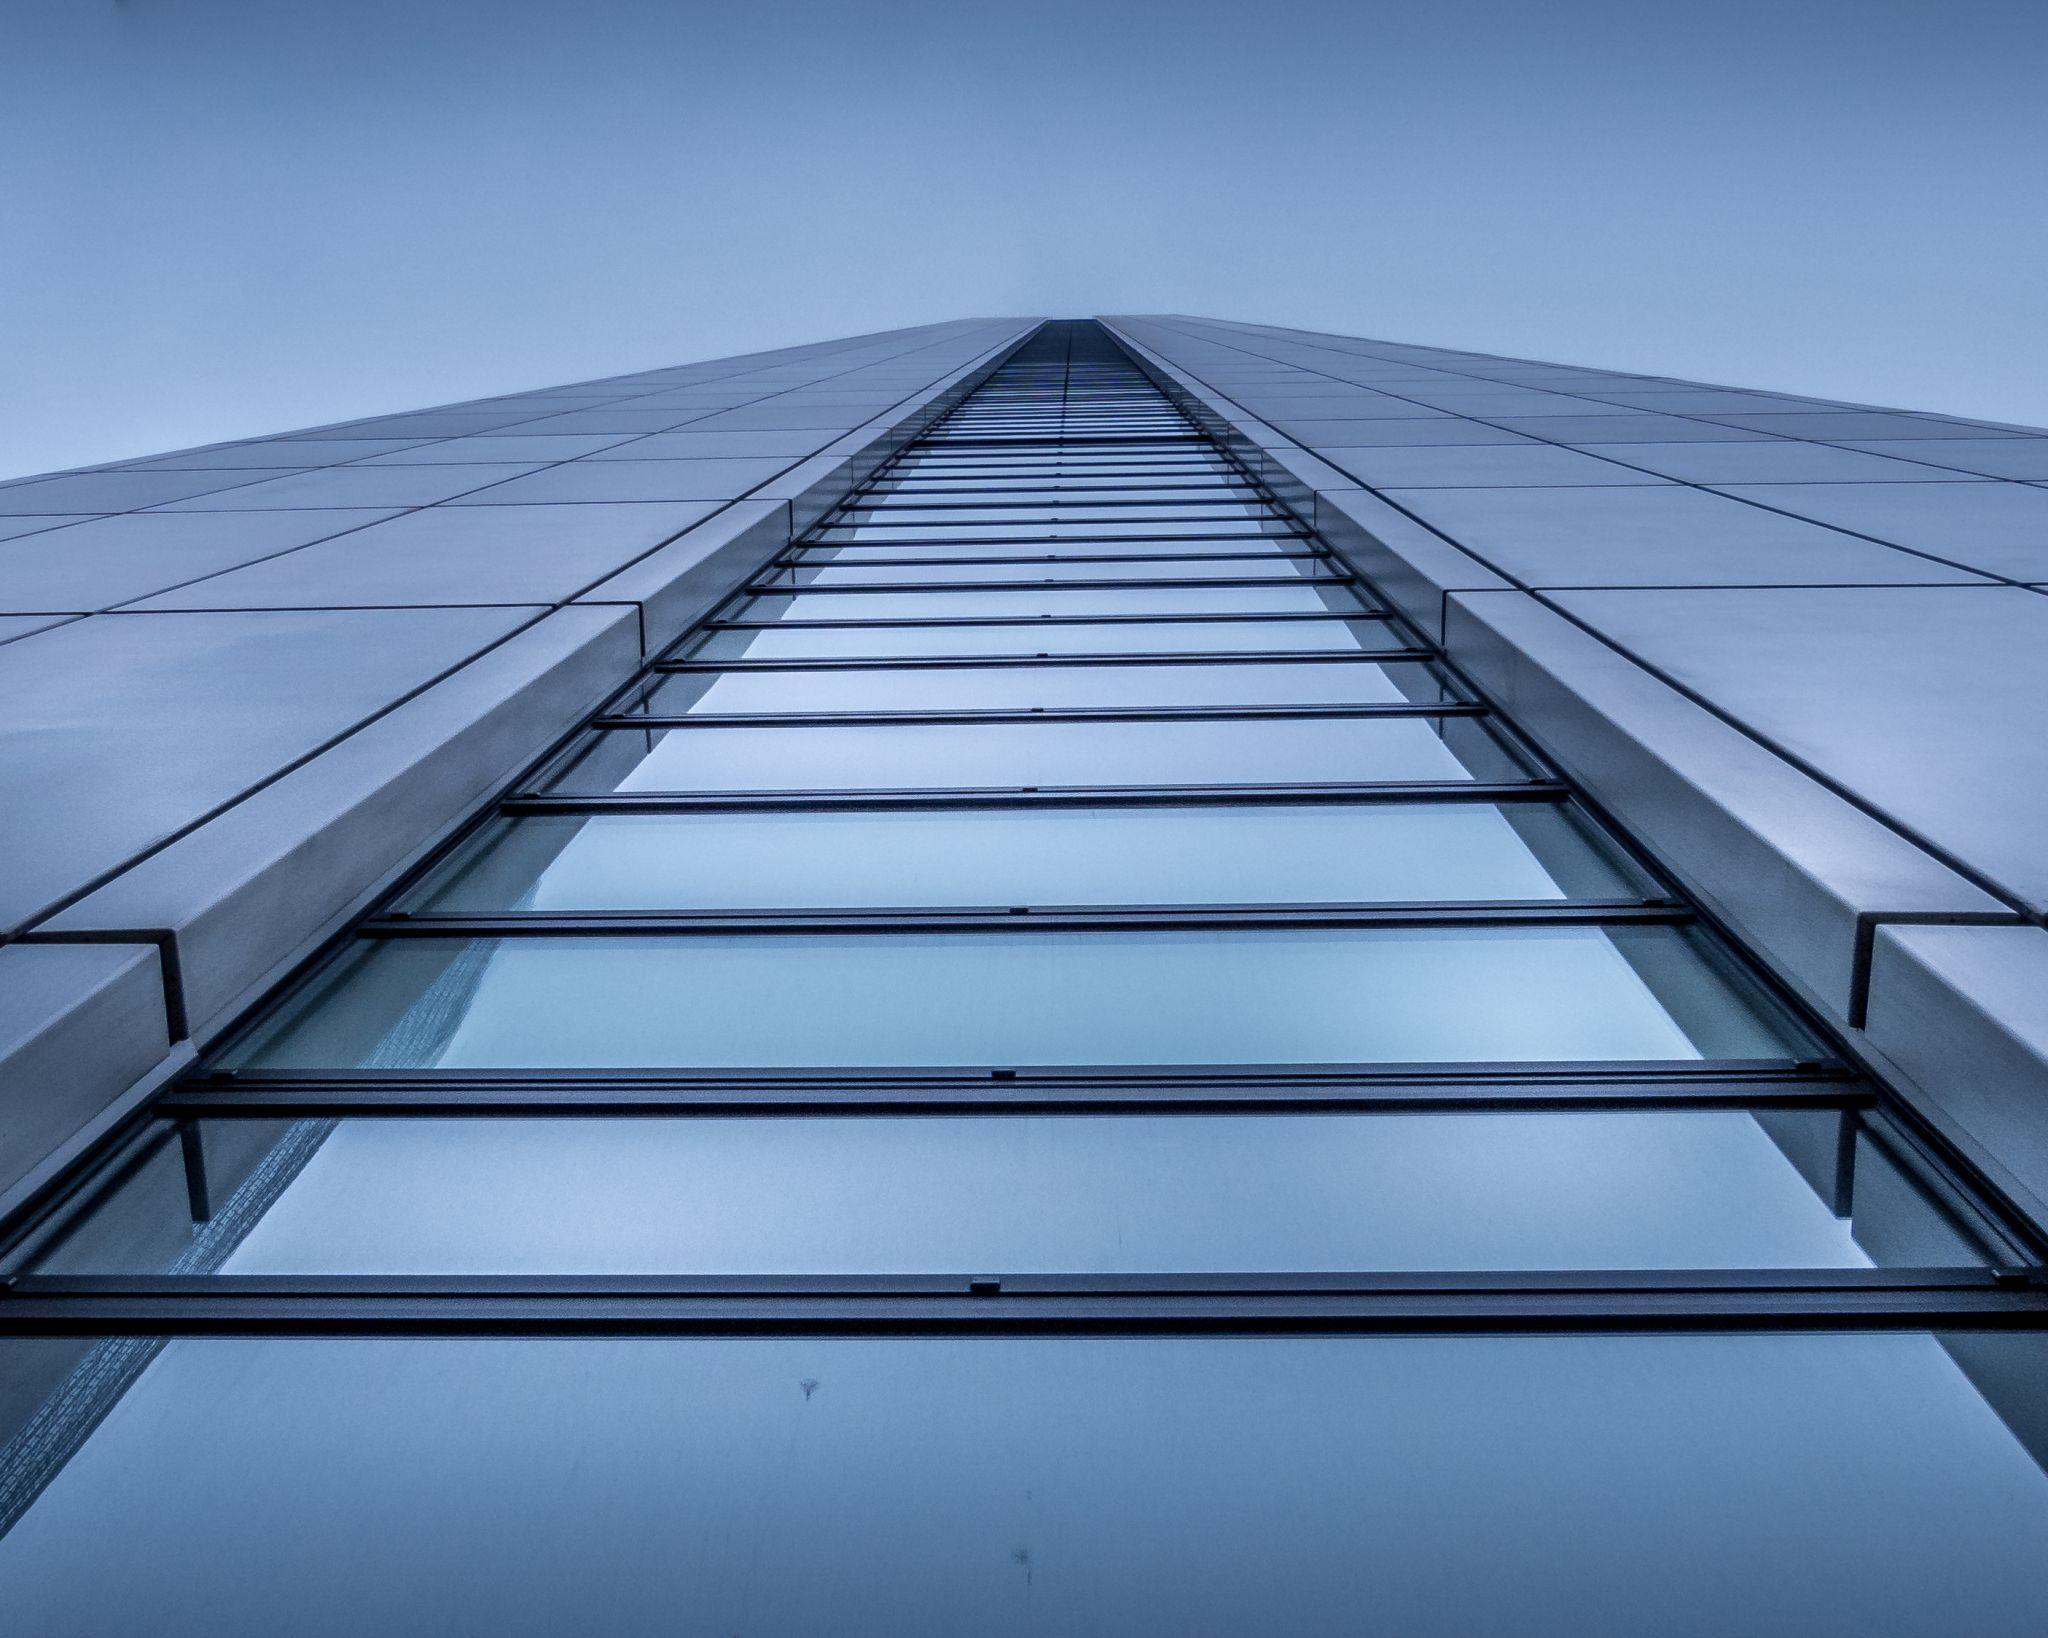 DB Tower Frankfurt, Germany